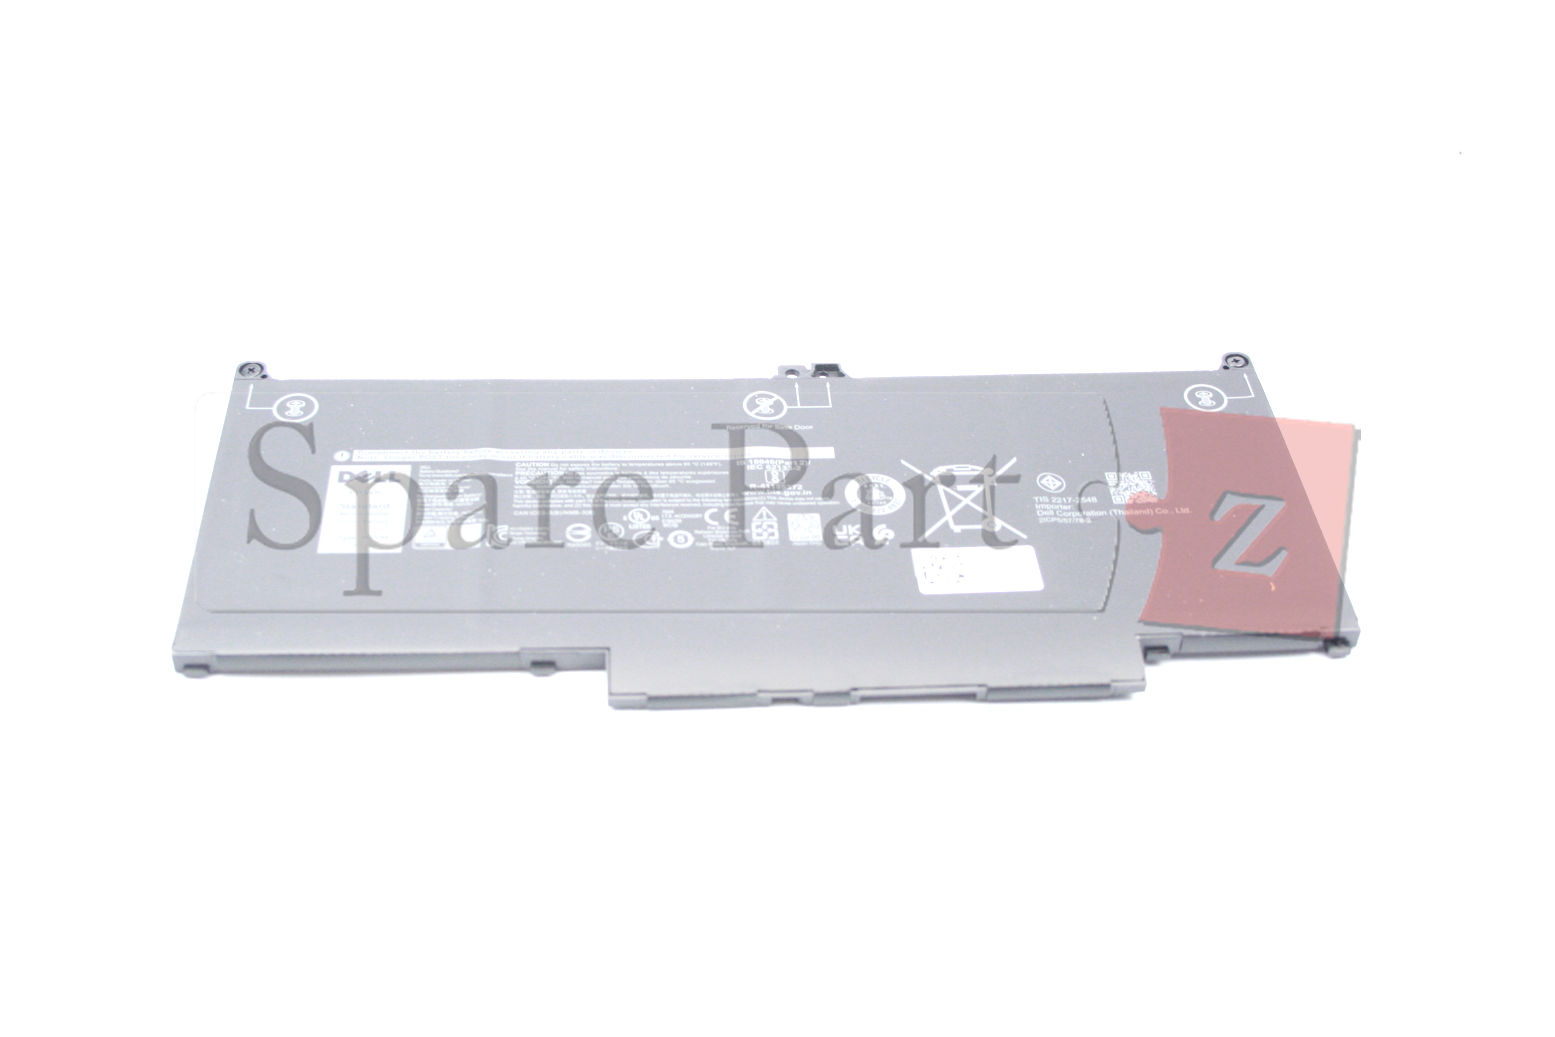 Original Dell Latitude 5310 7400 7300 5300 60Wh Akku Battery 0CR8V9